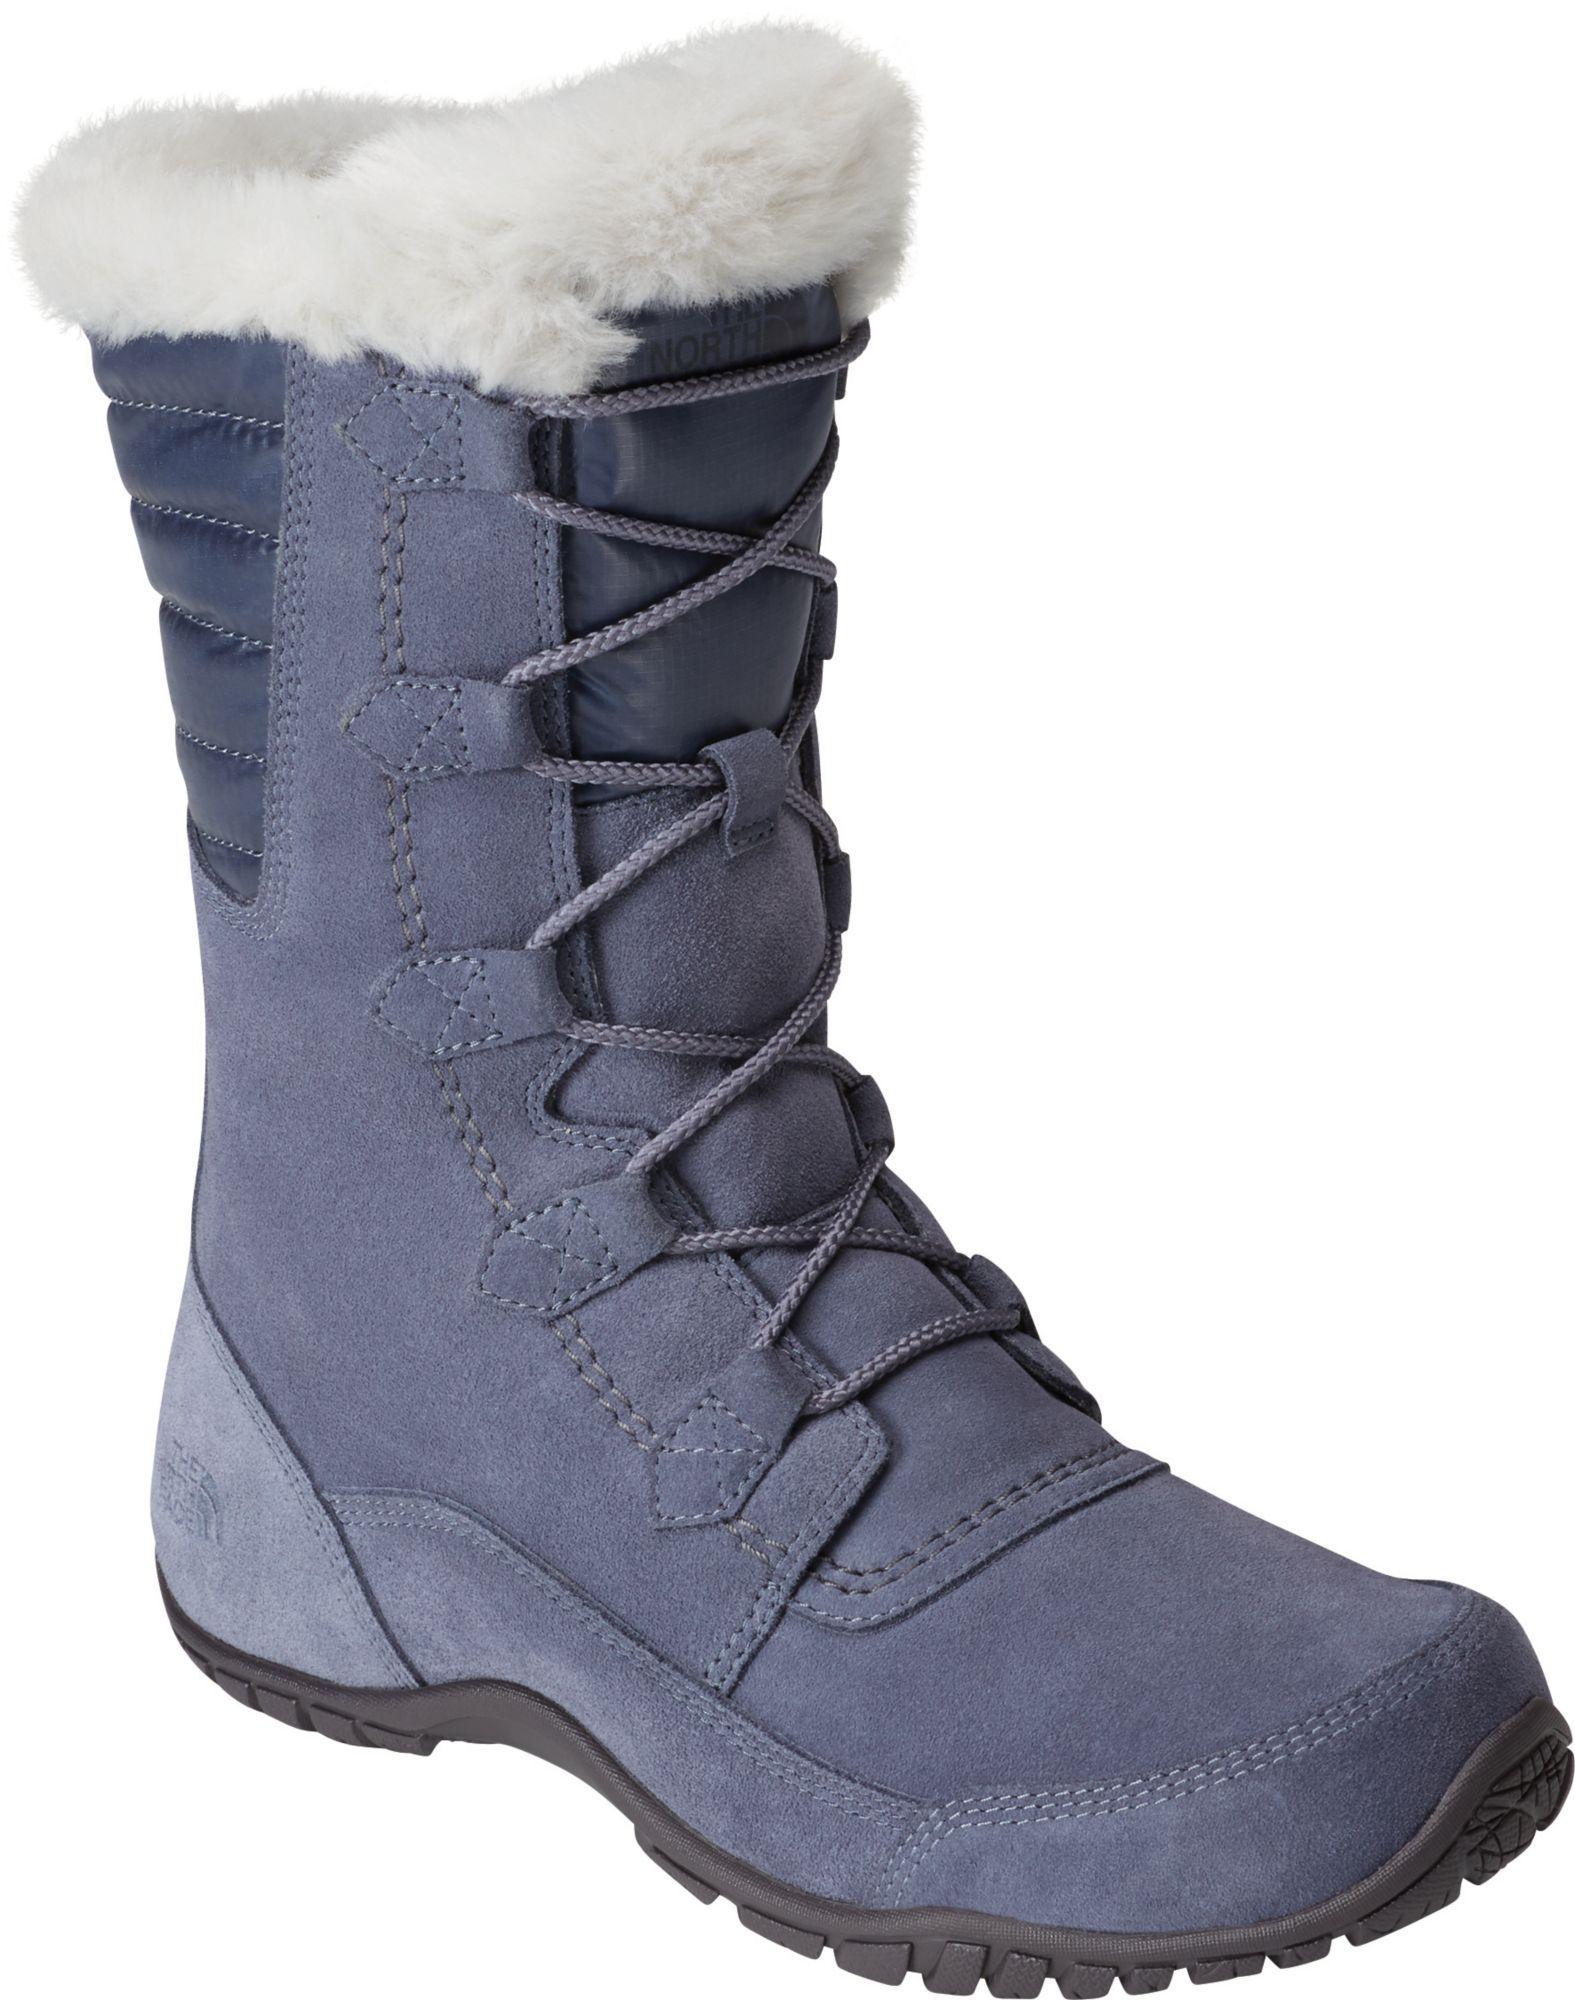 Zapatos de mujer. shoeFashionista - Botas De Nieve Agua Invierno Esquiar Zapatos  Para Mujer  abfc4059681